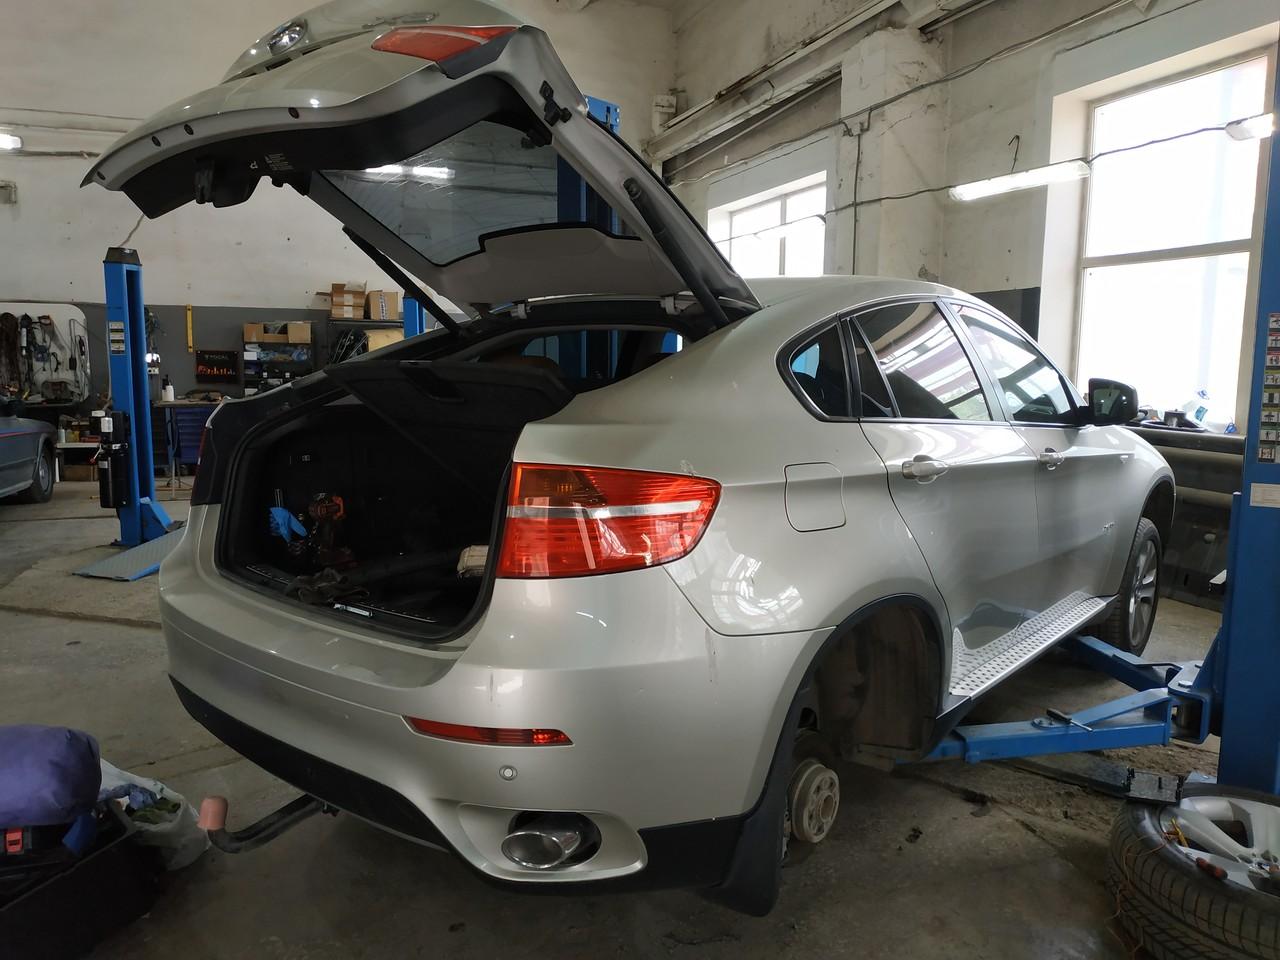 E71, Ремонт парковочного тормоза